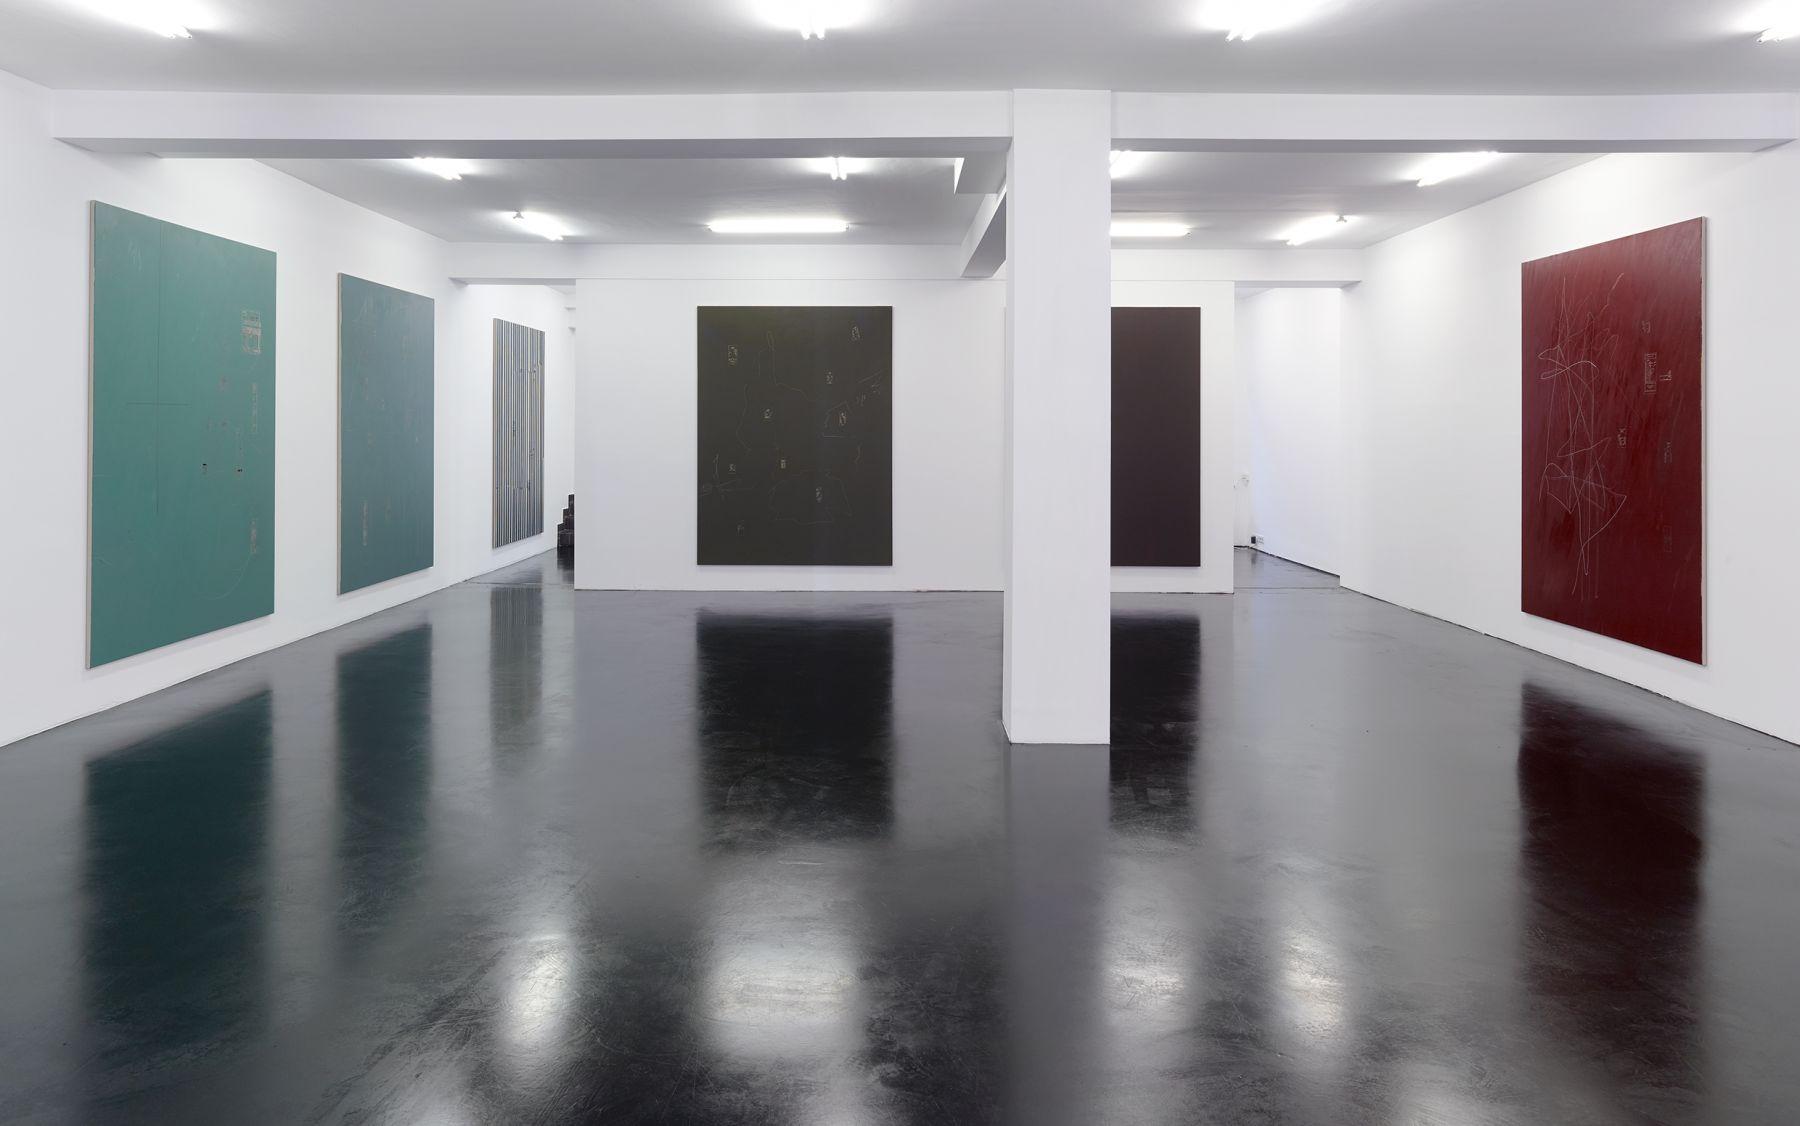 Egan Franz. Not Yet No Longer. Installation View Galerie Nagel Draxler Cologne 2018. photo credit: Simon Vogel